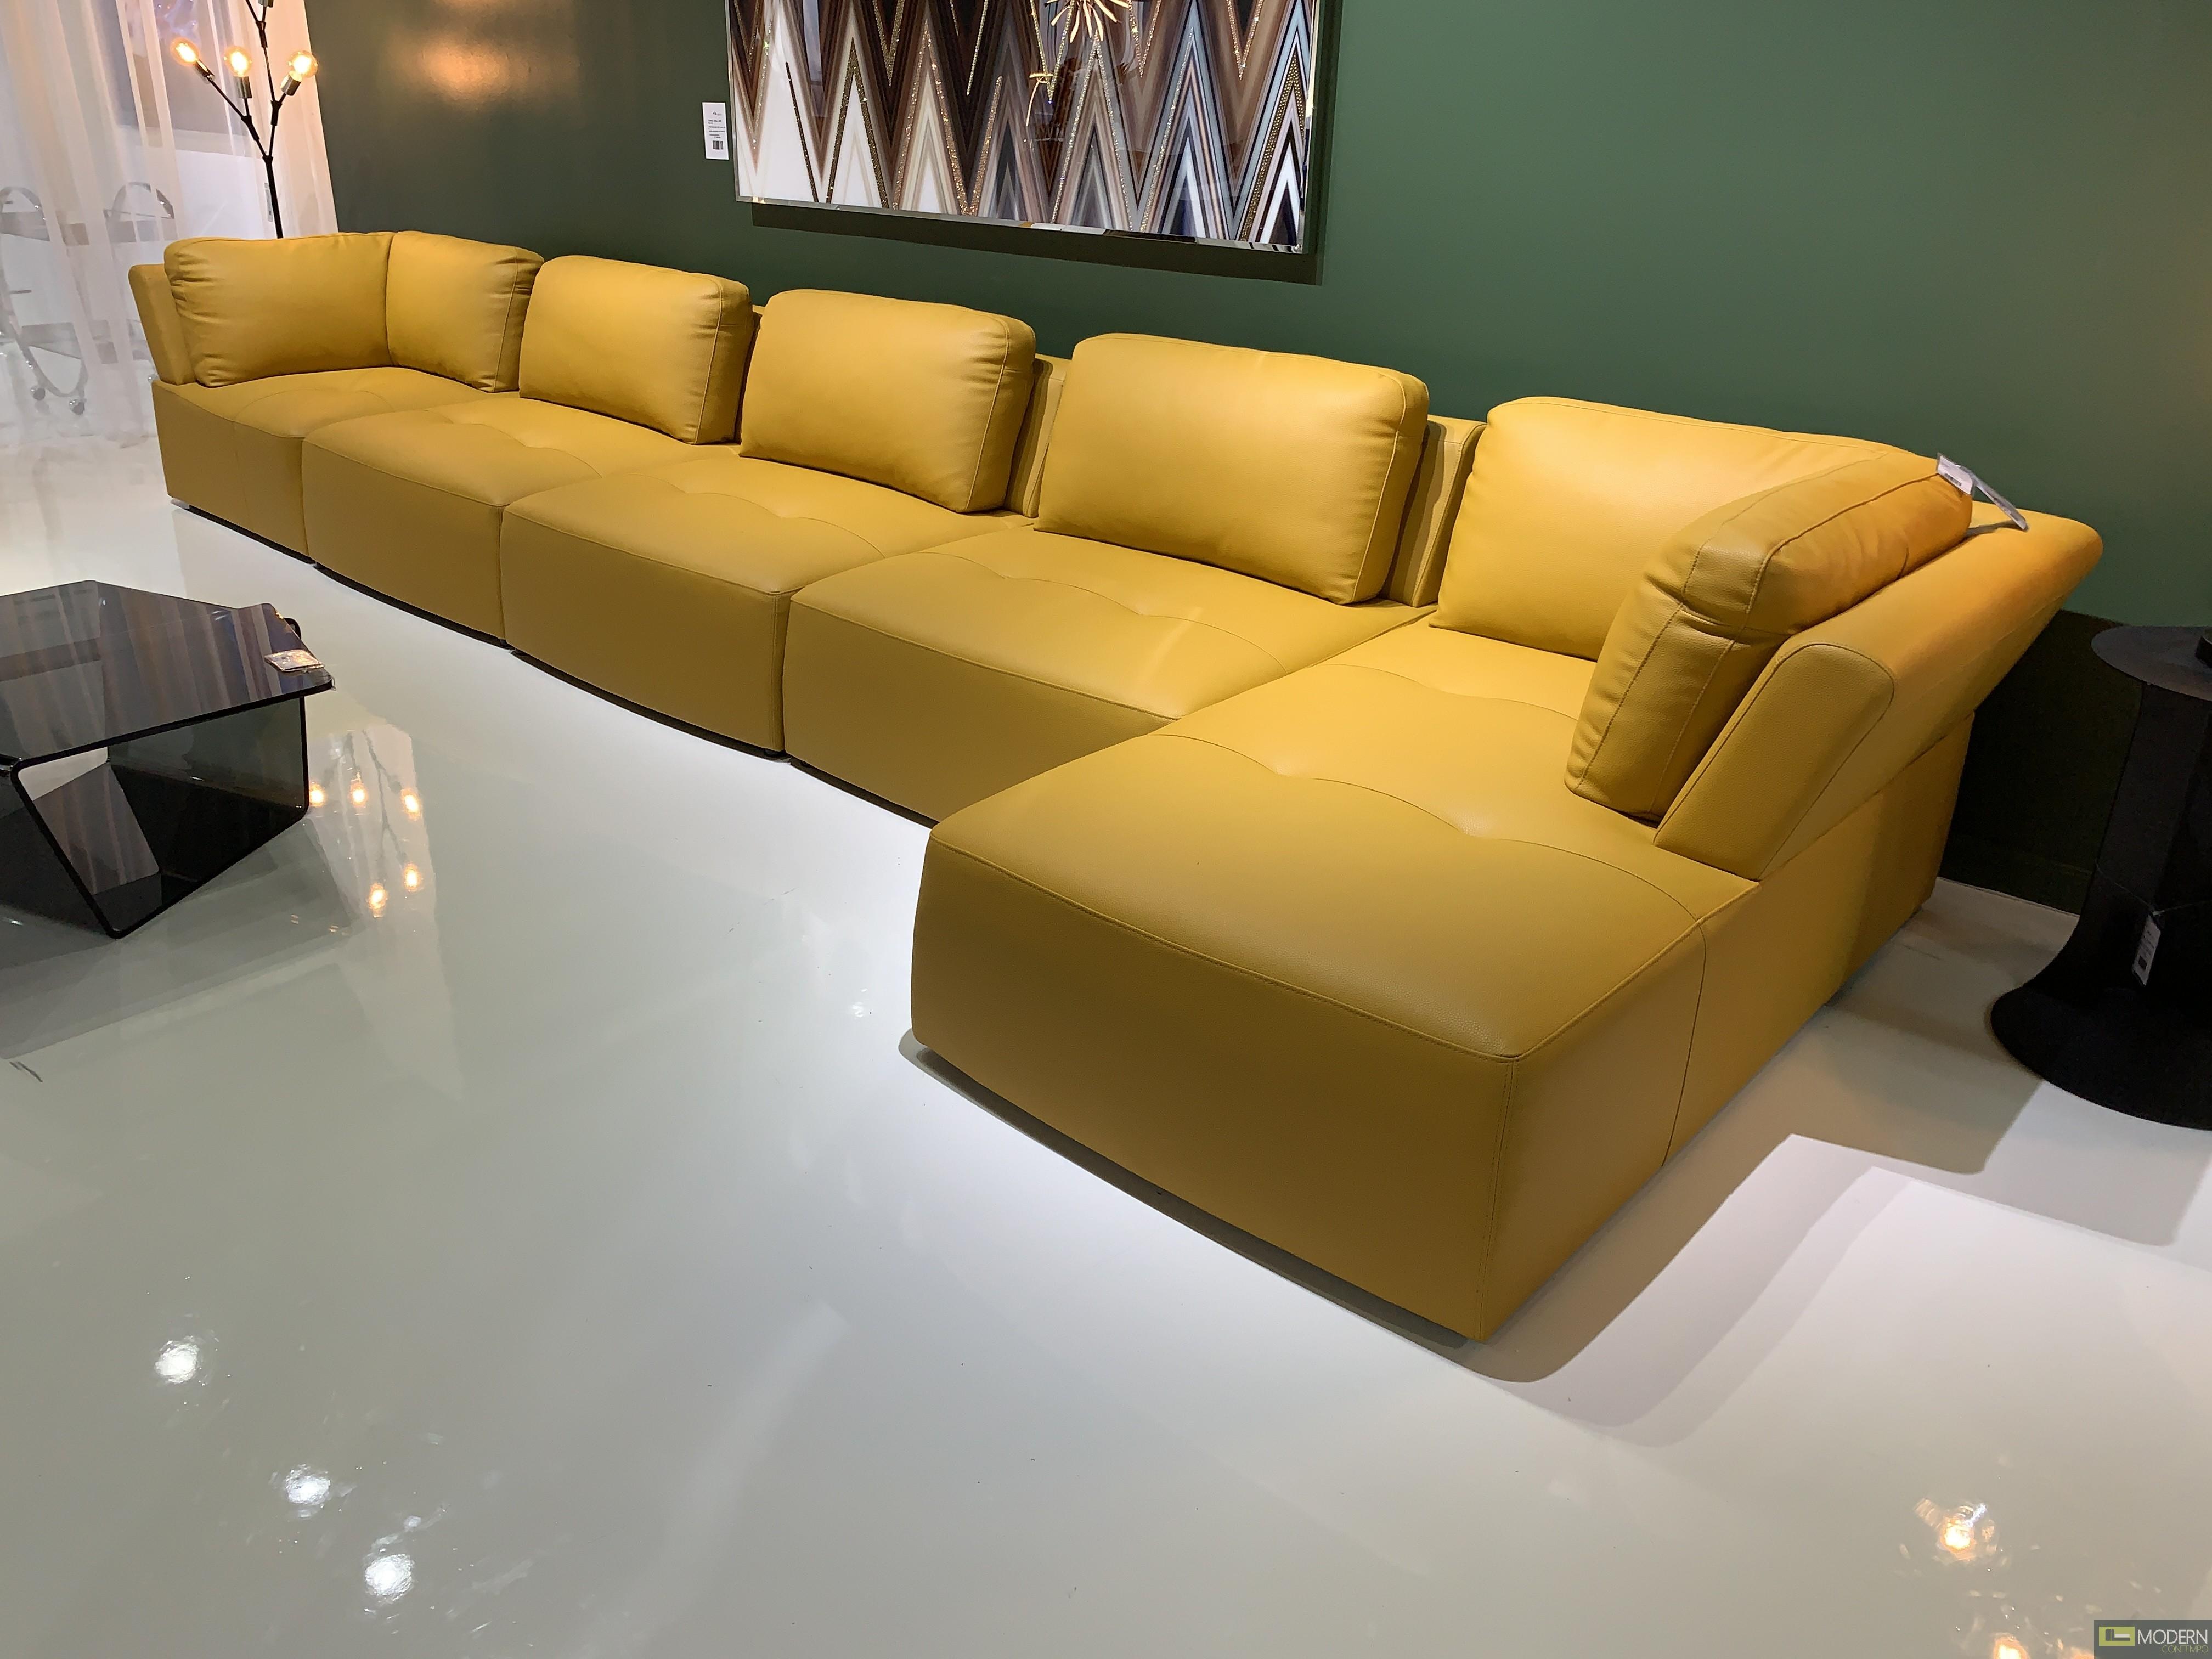 Zola 6Pc Yellow Leather Modular Sectional